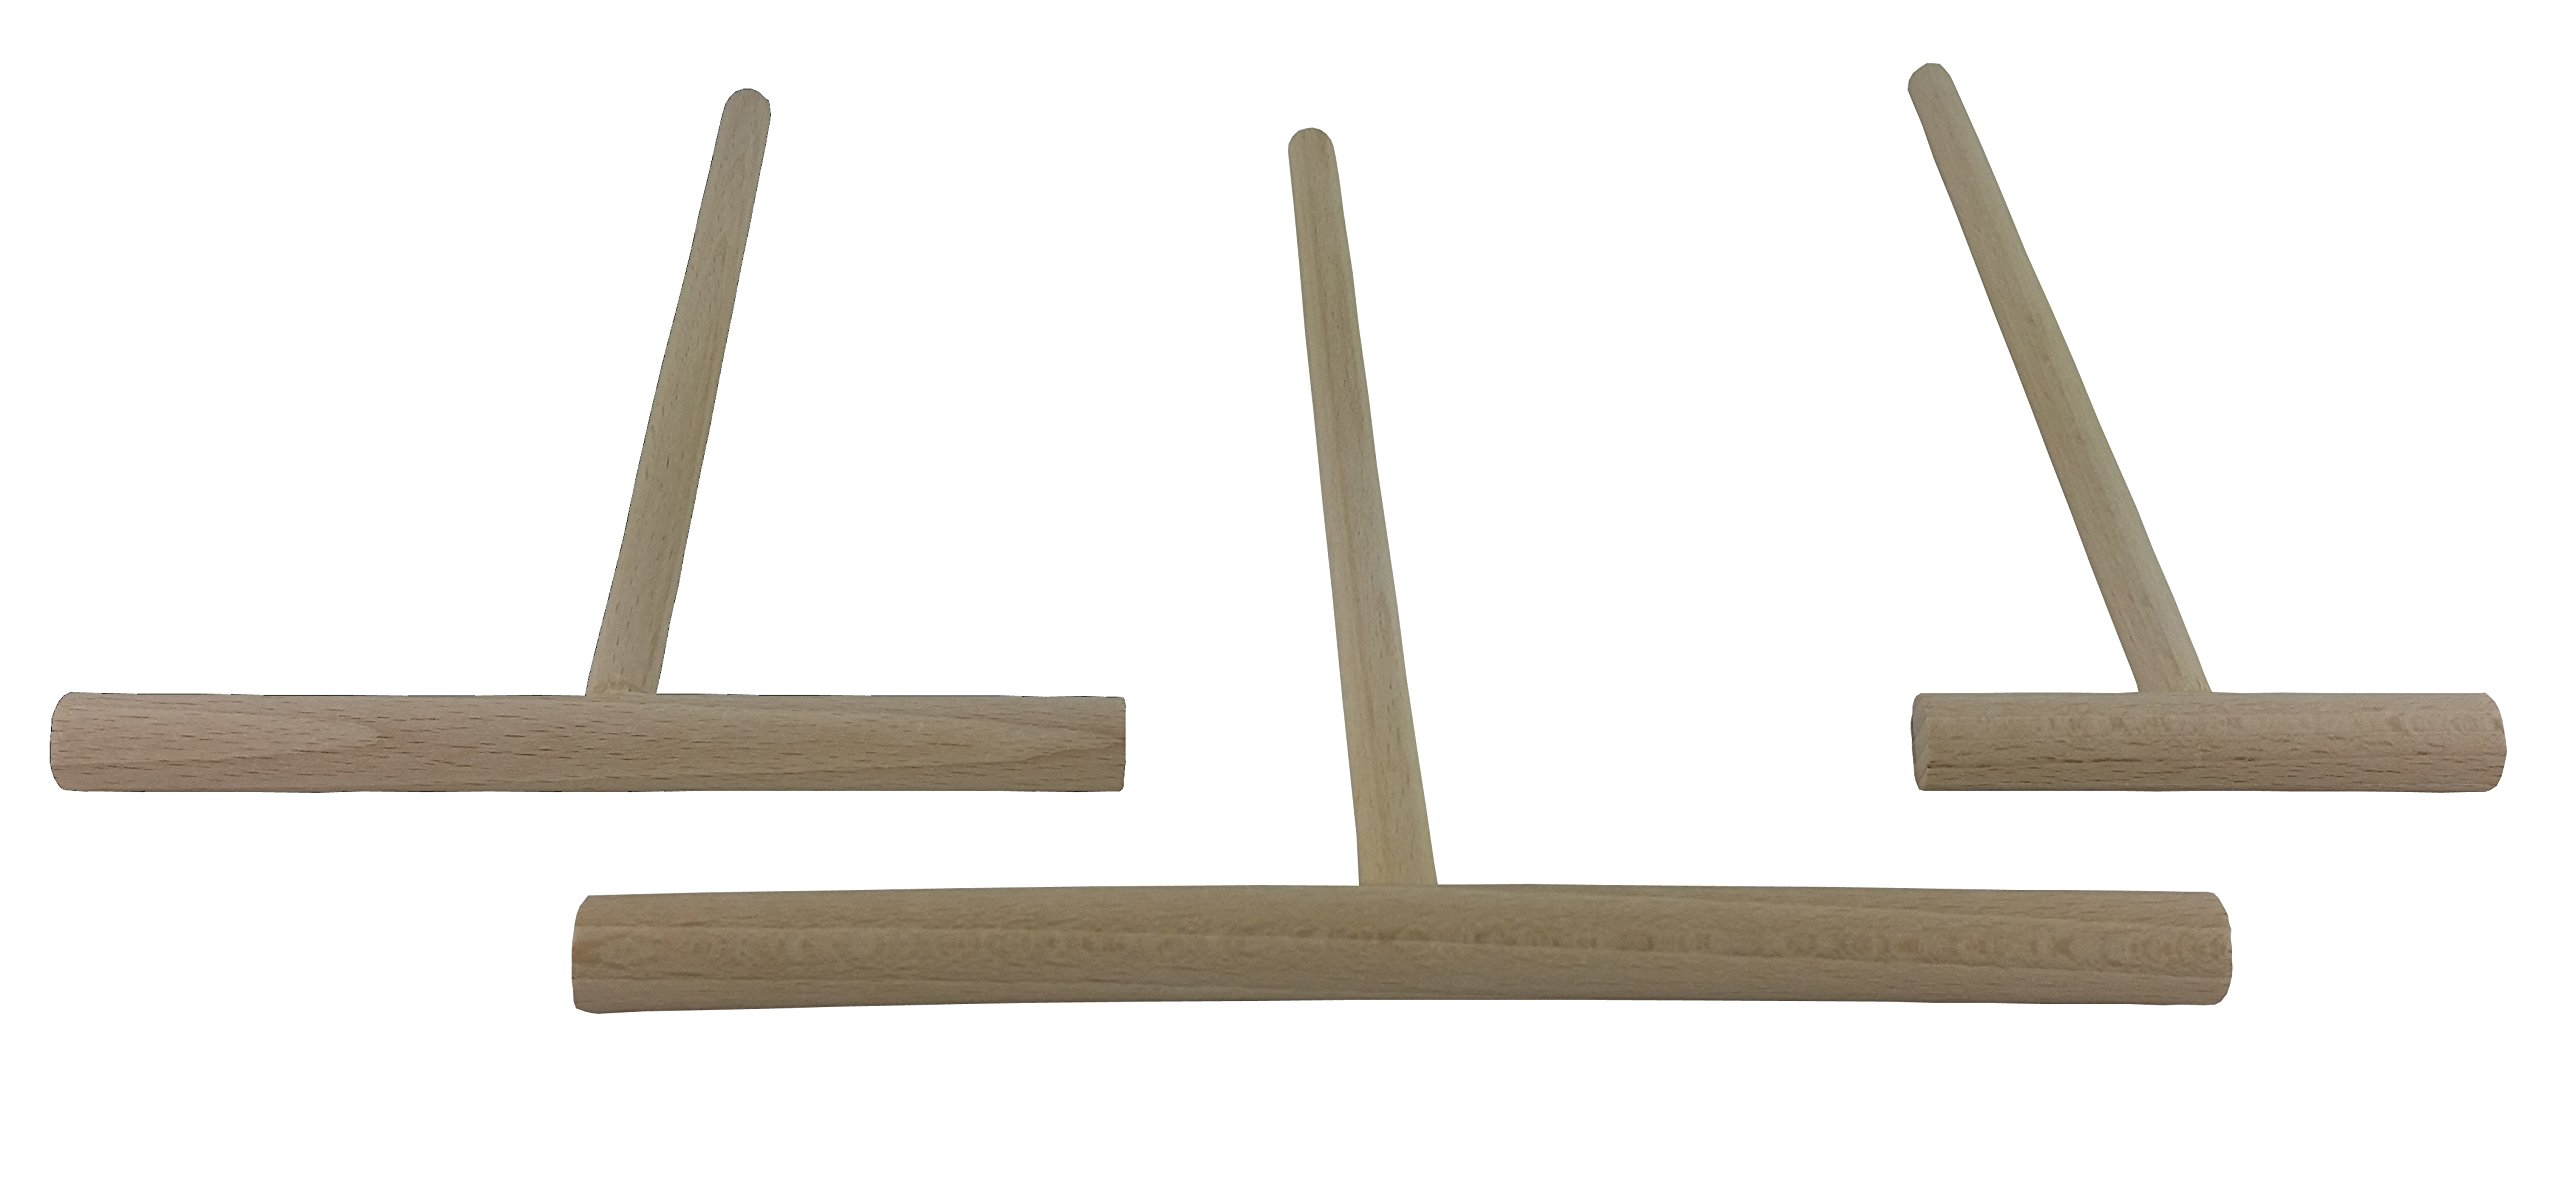 BICB Beechwood Crepe Spreader - 3 Piece Set (7.9-inch and 5.5-inch and 3-inch Spreader )